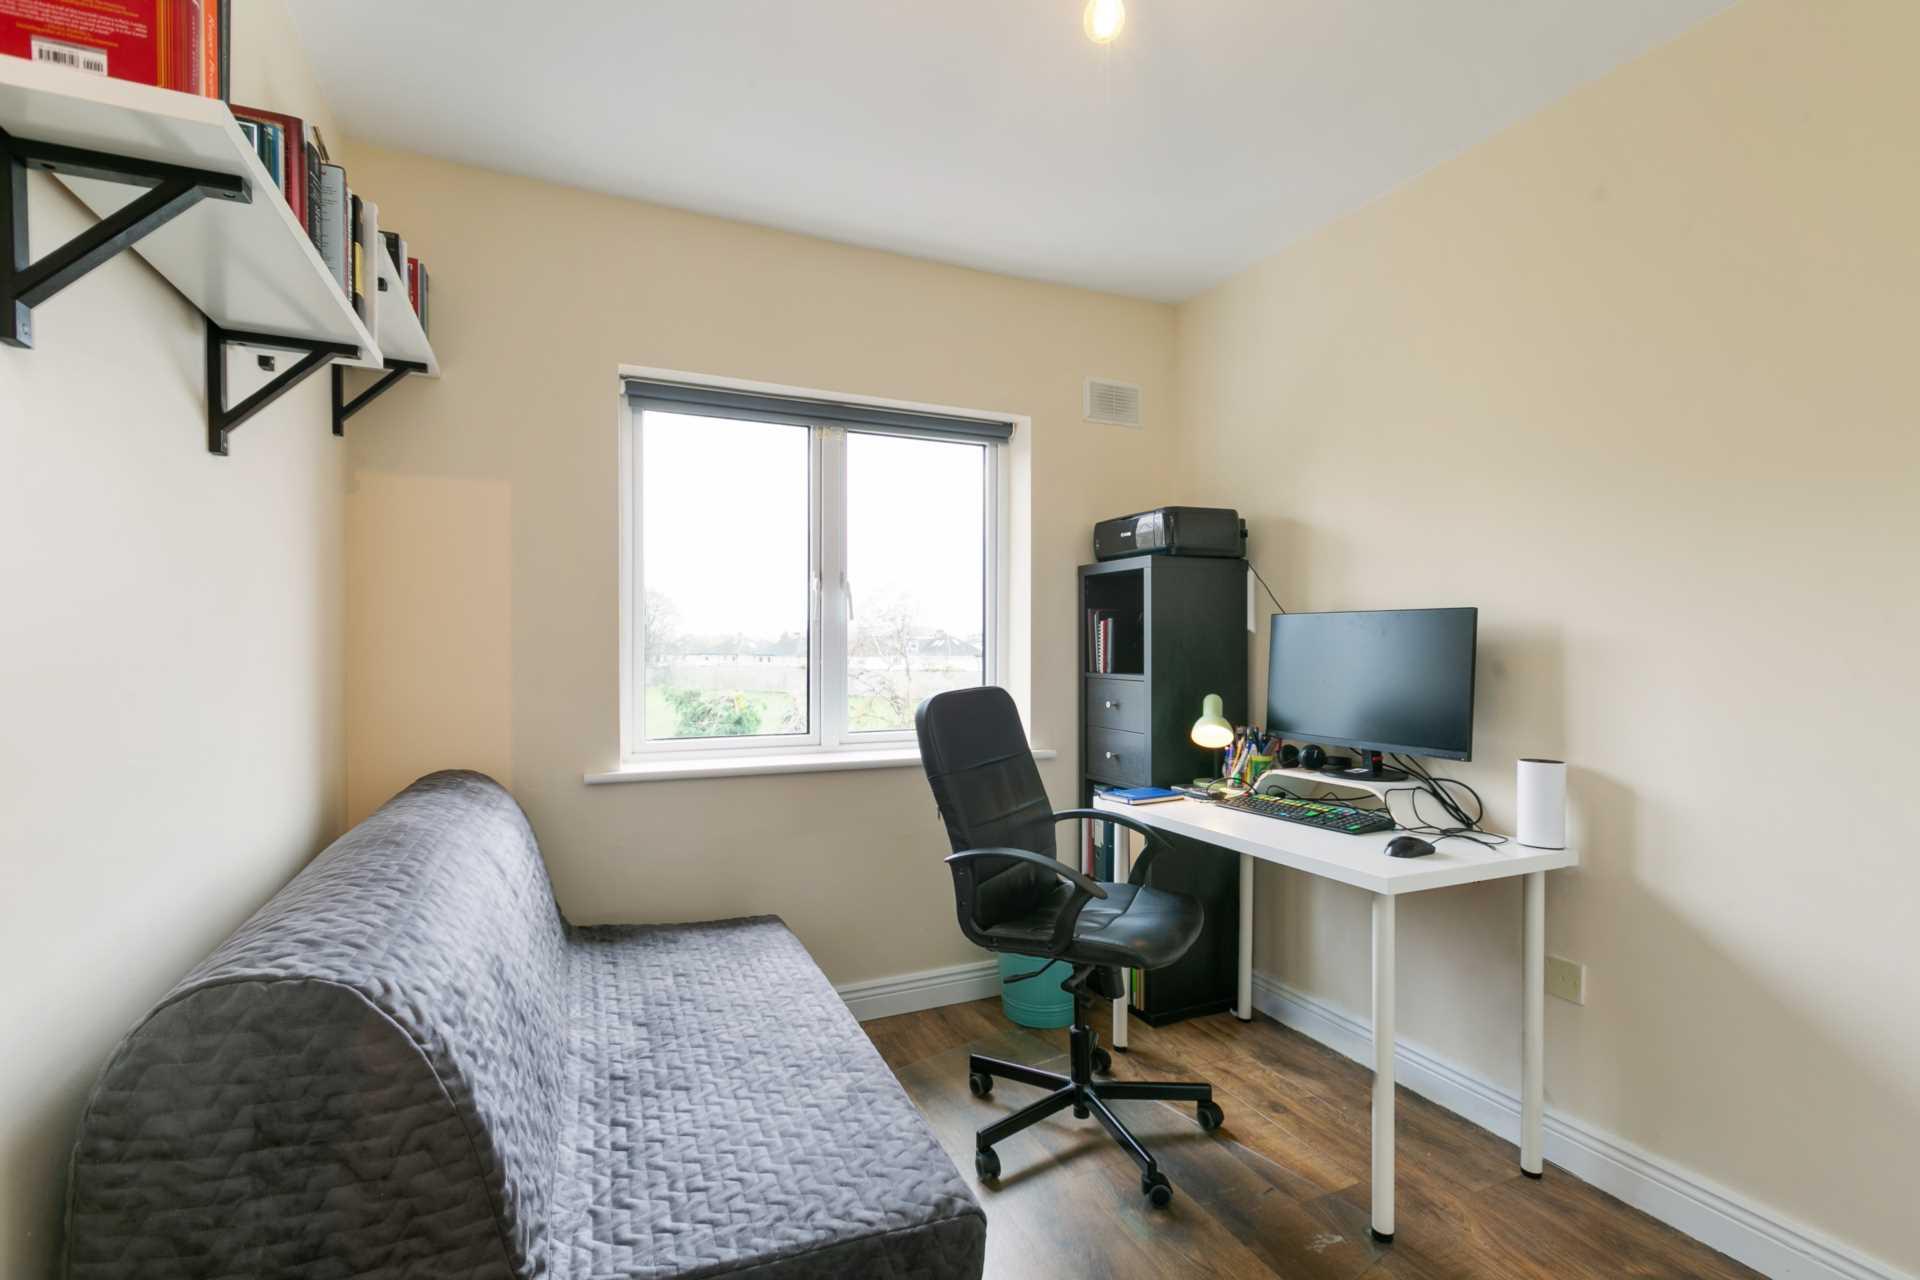 20 Kilvere Park, Cypress Downs, Templeogue, Dublin 6W, Image 9